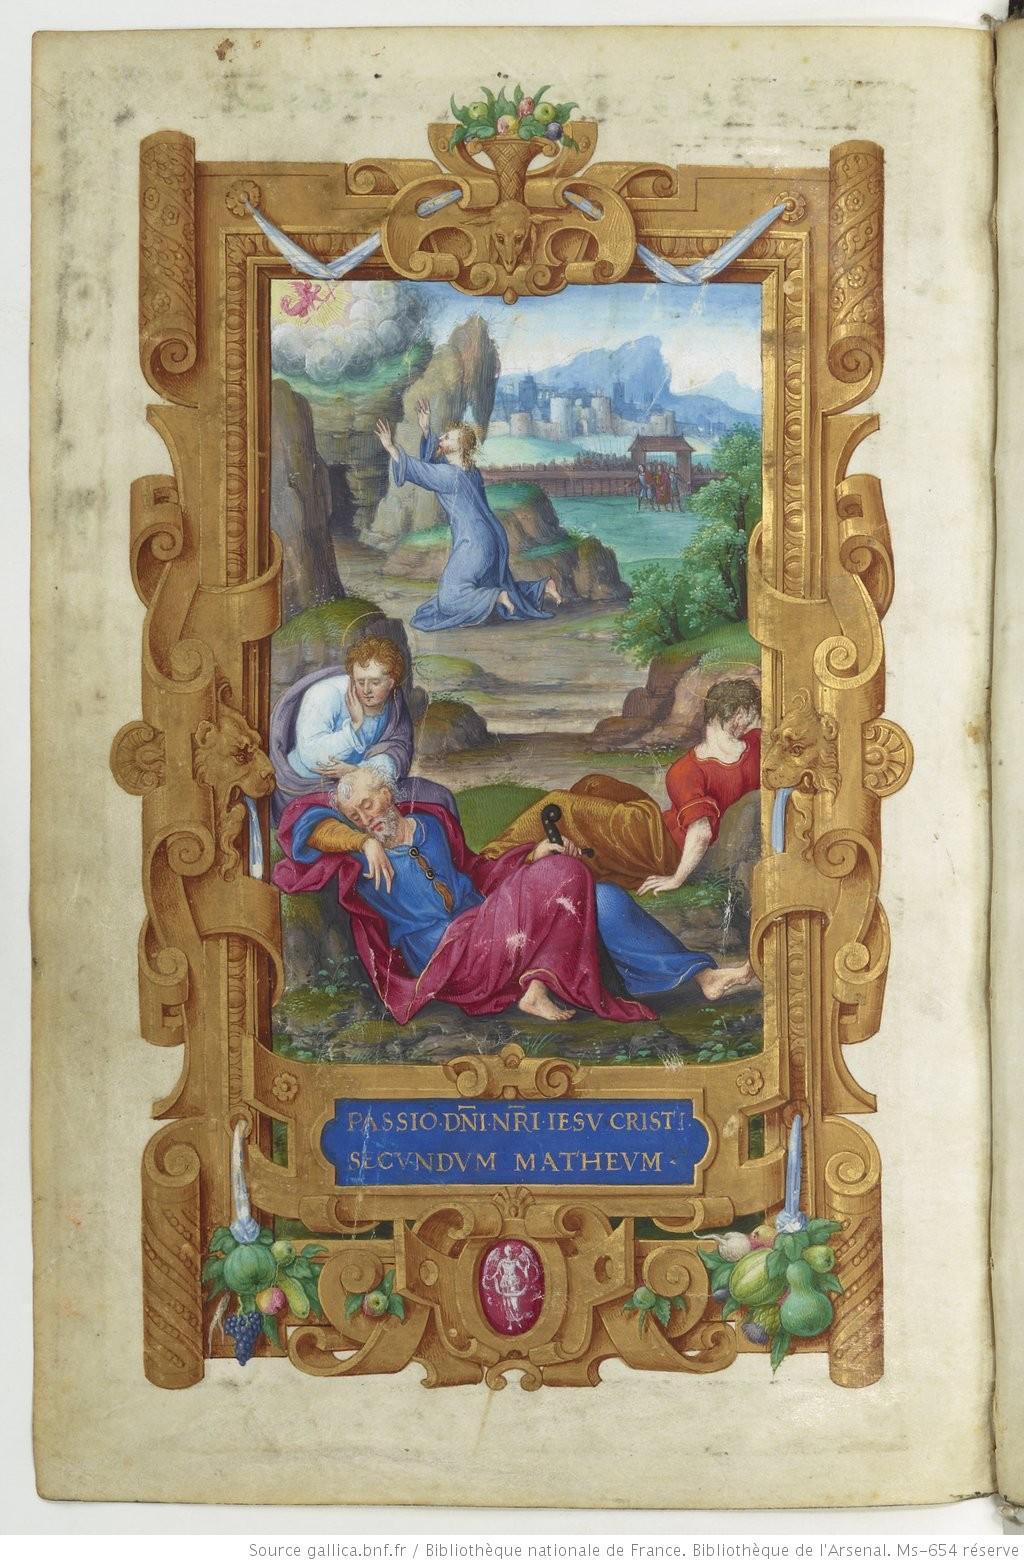 23B Noël Bellemare d1546 Livre d heures de Claude de Guise MS 654 fol 91v 1501to50